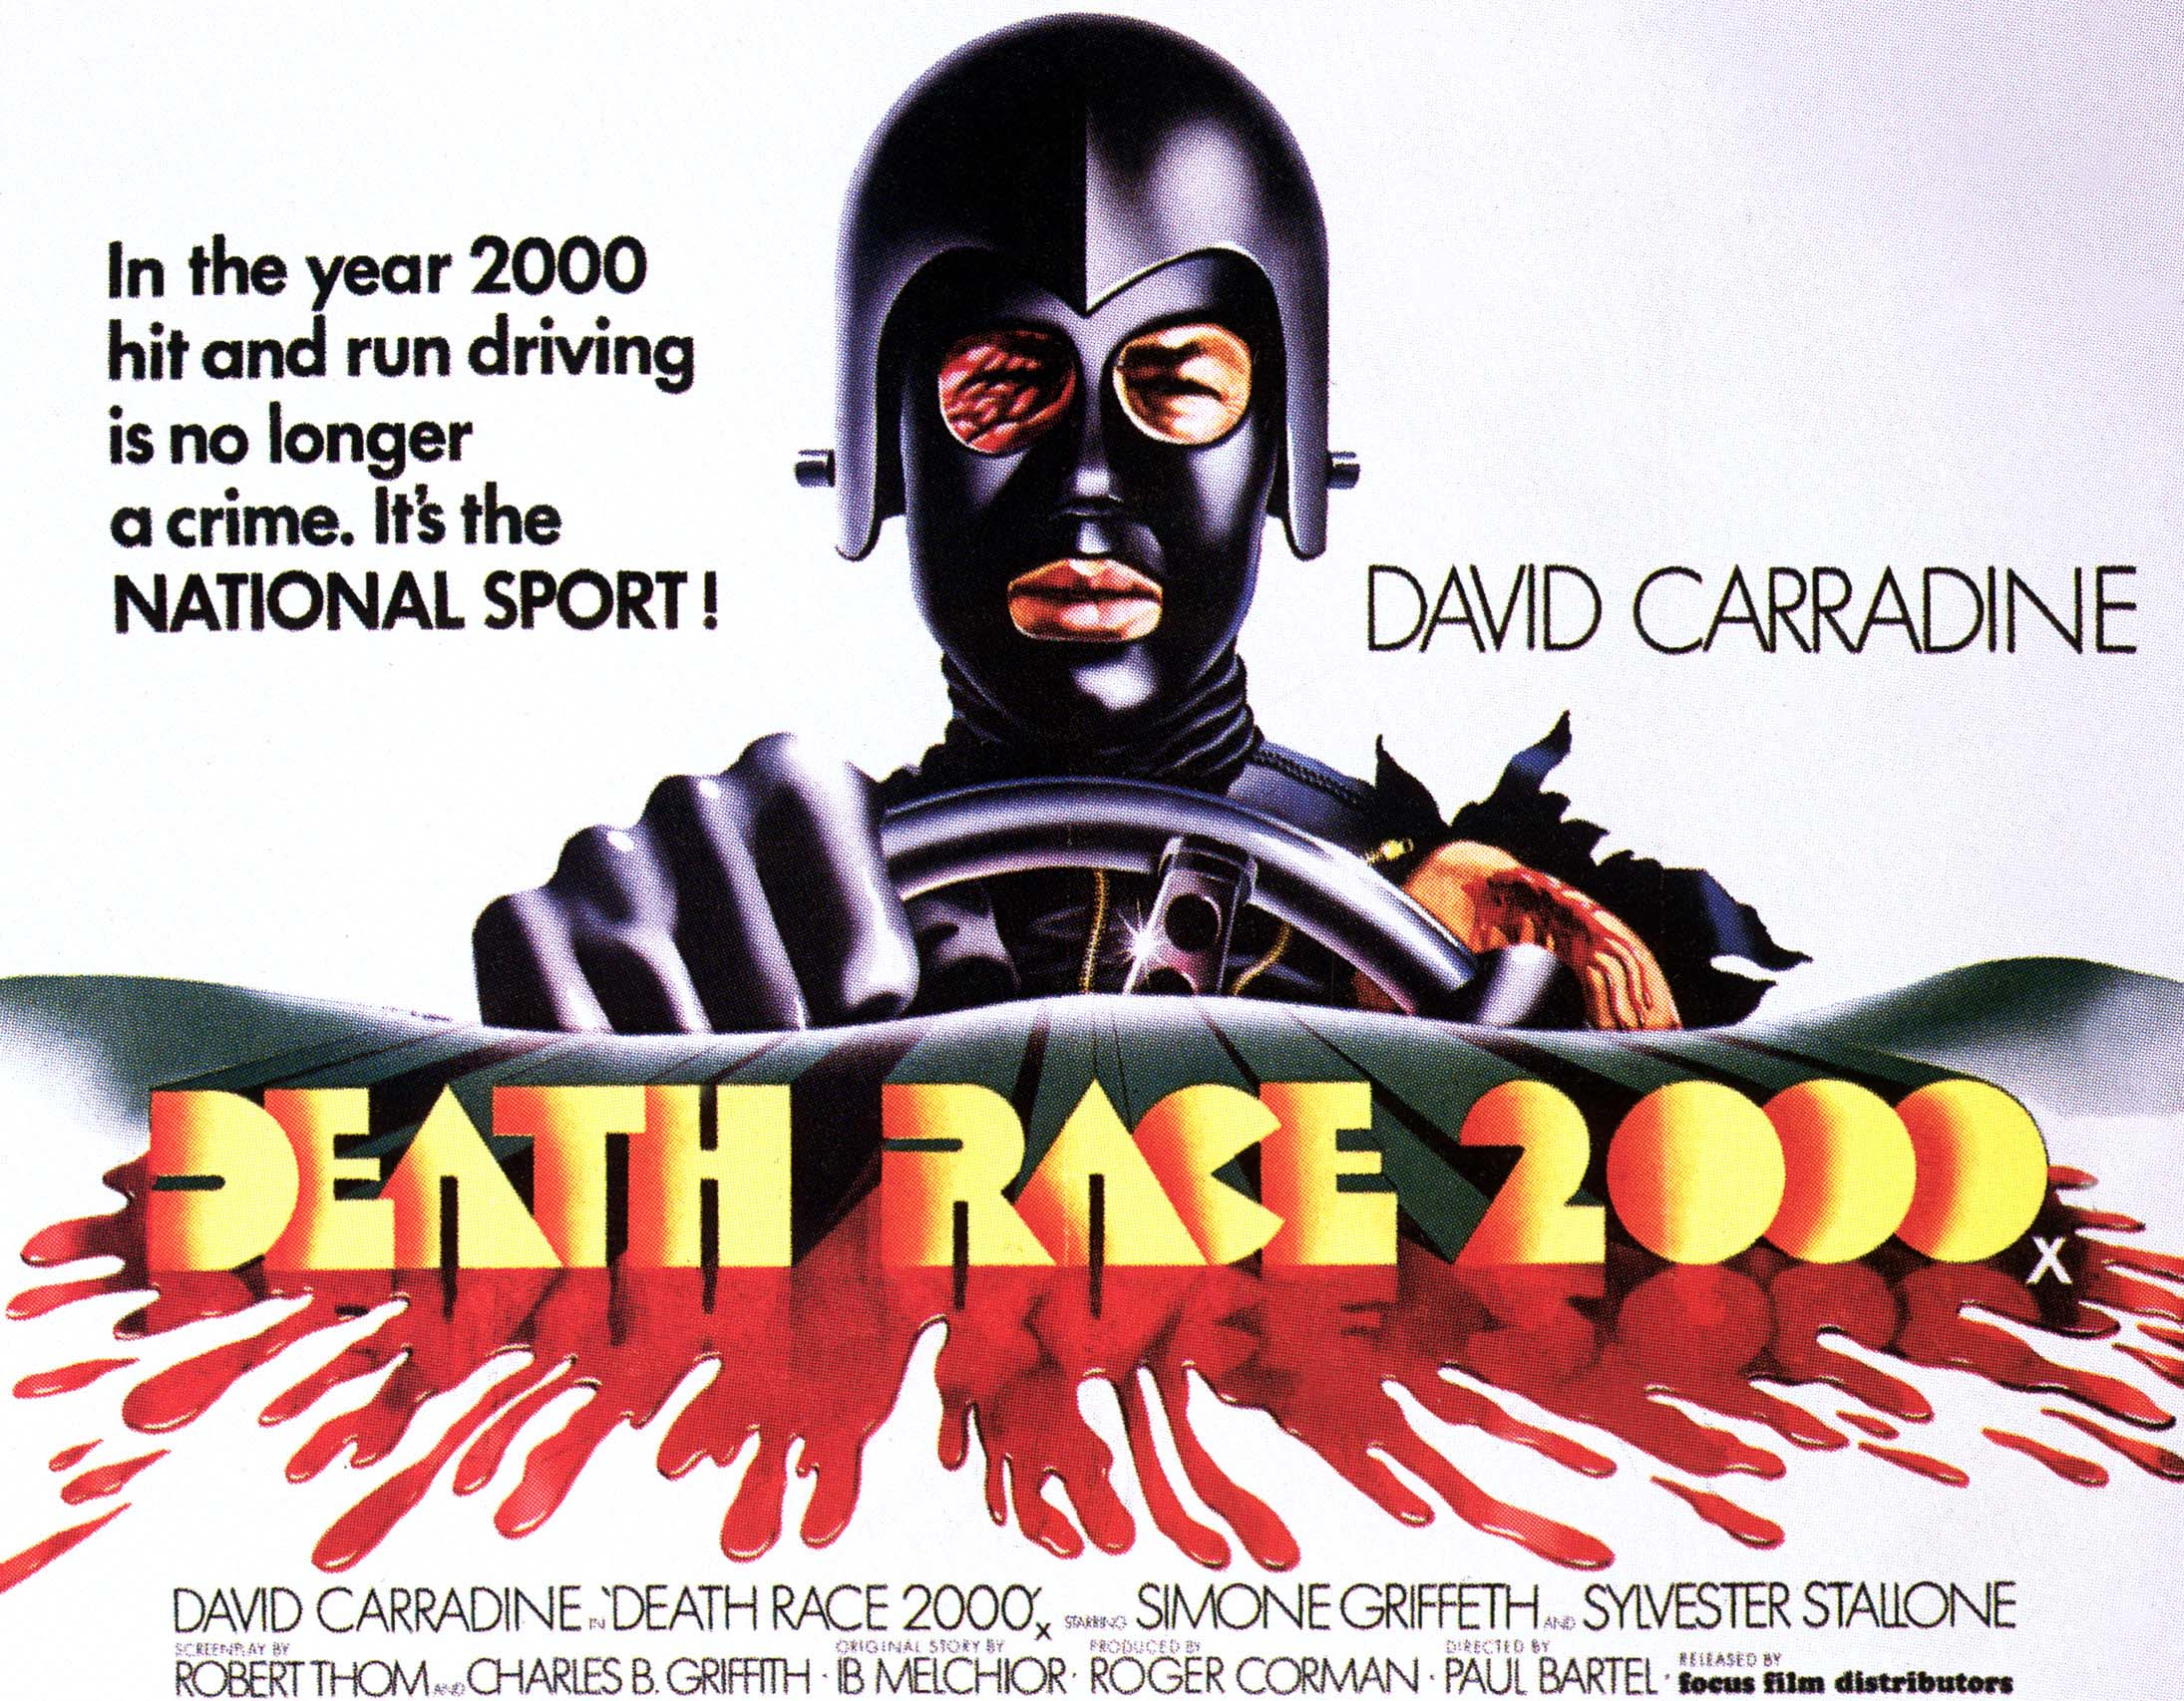 Death Race 2000 - Poster.jpg